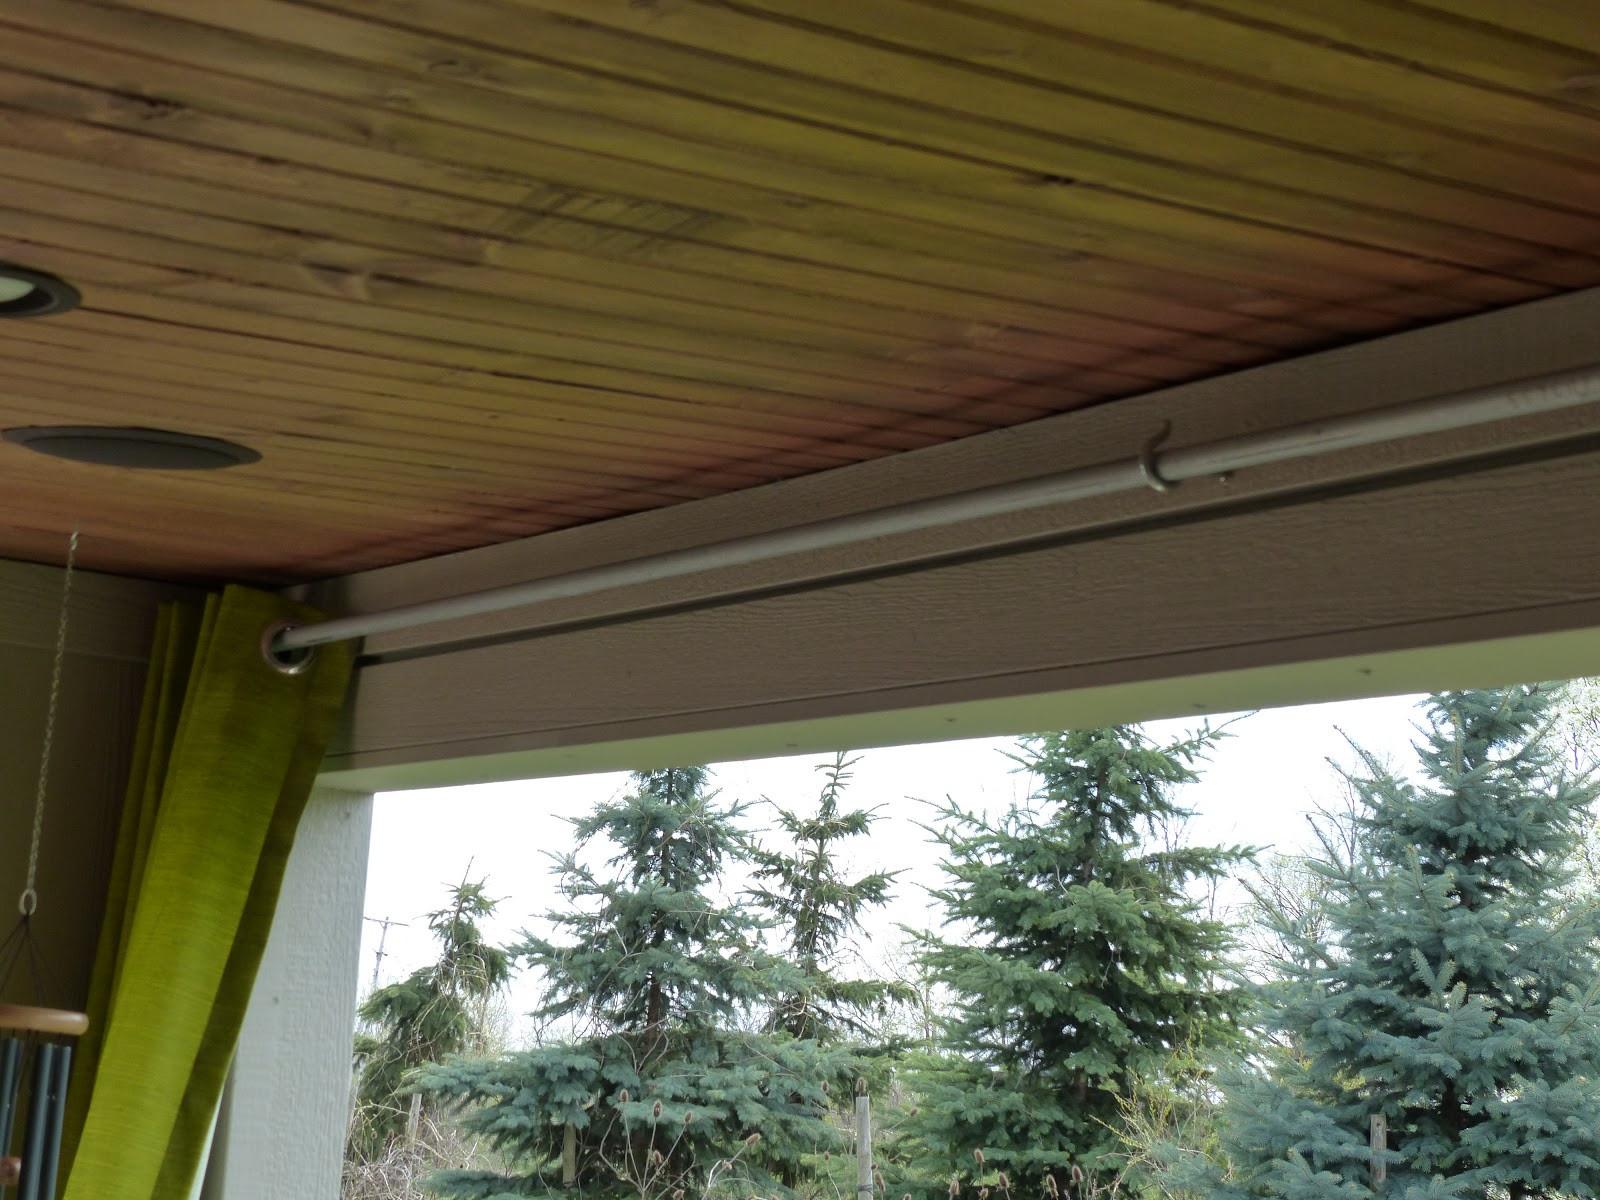 DIY Outdoor Curtain Rod  JULIE PETERSON Simple Redesign DIY BUDGET OUTDOOR